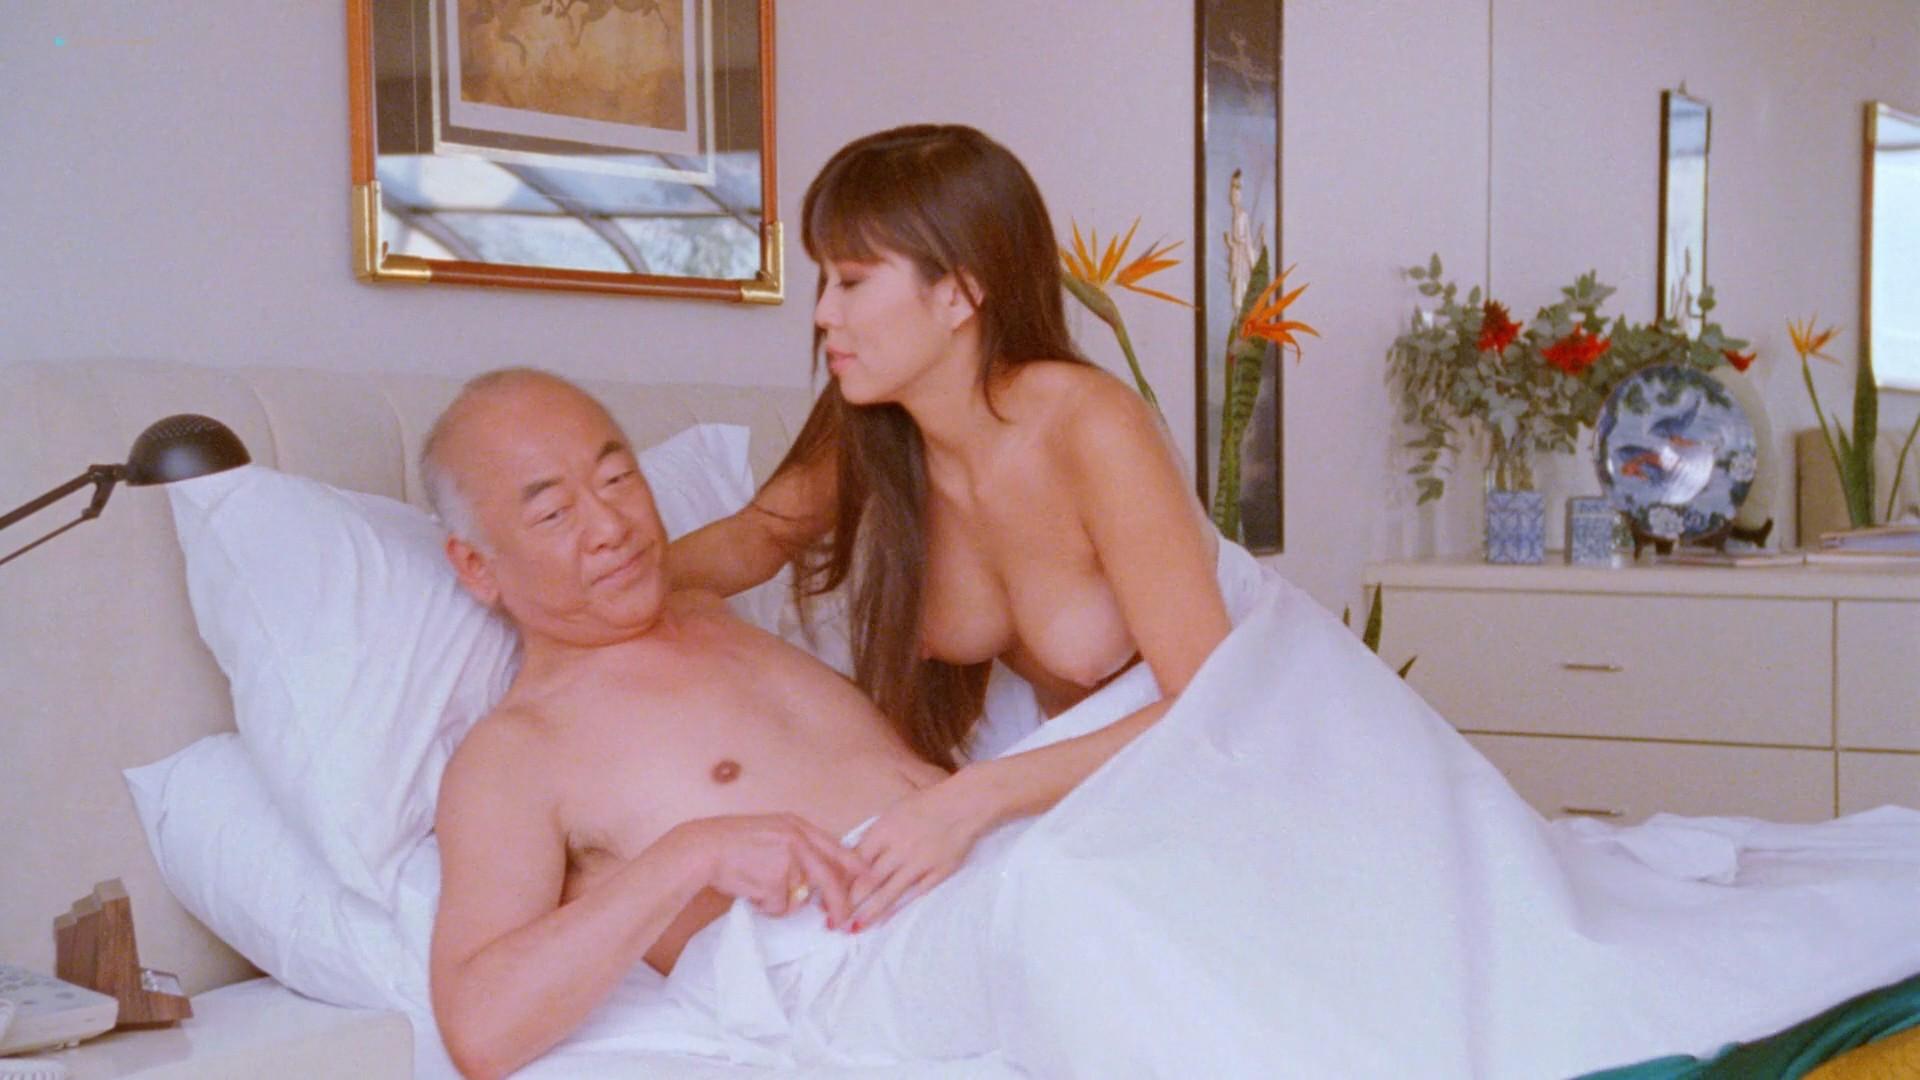 Dona Speir nude Pandora Peaks, Carolyn Liu and others nude too - Do or Die (1991) 1080p BluRay (9)